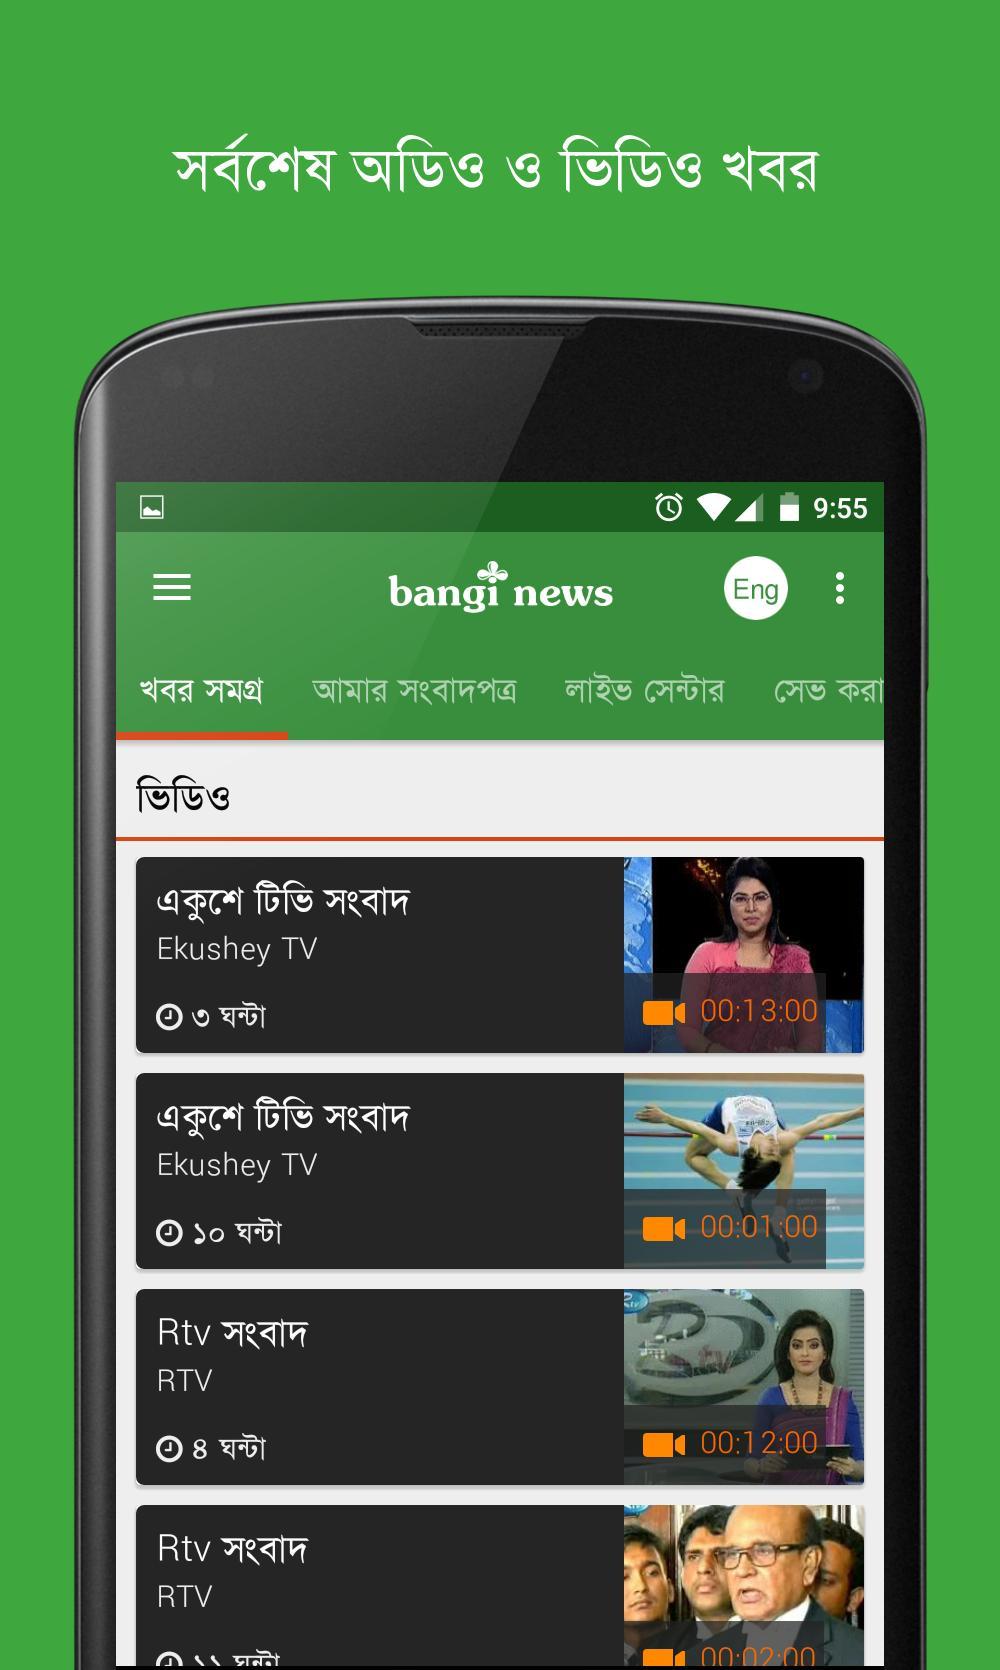 Bangla News & TV: Bangi News 3 تصوير الشاشة